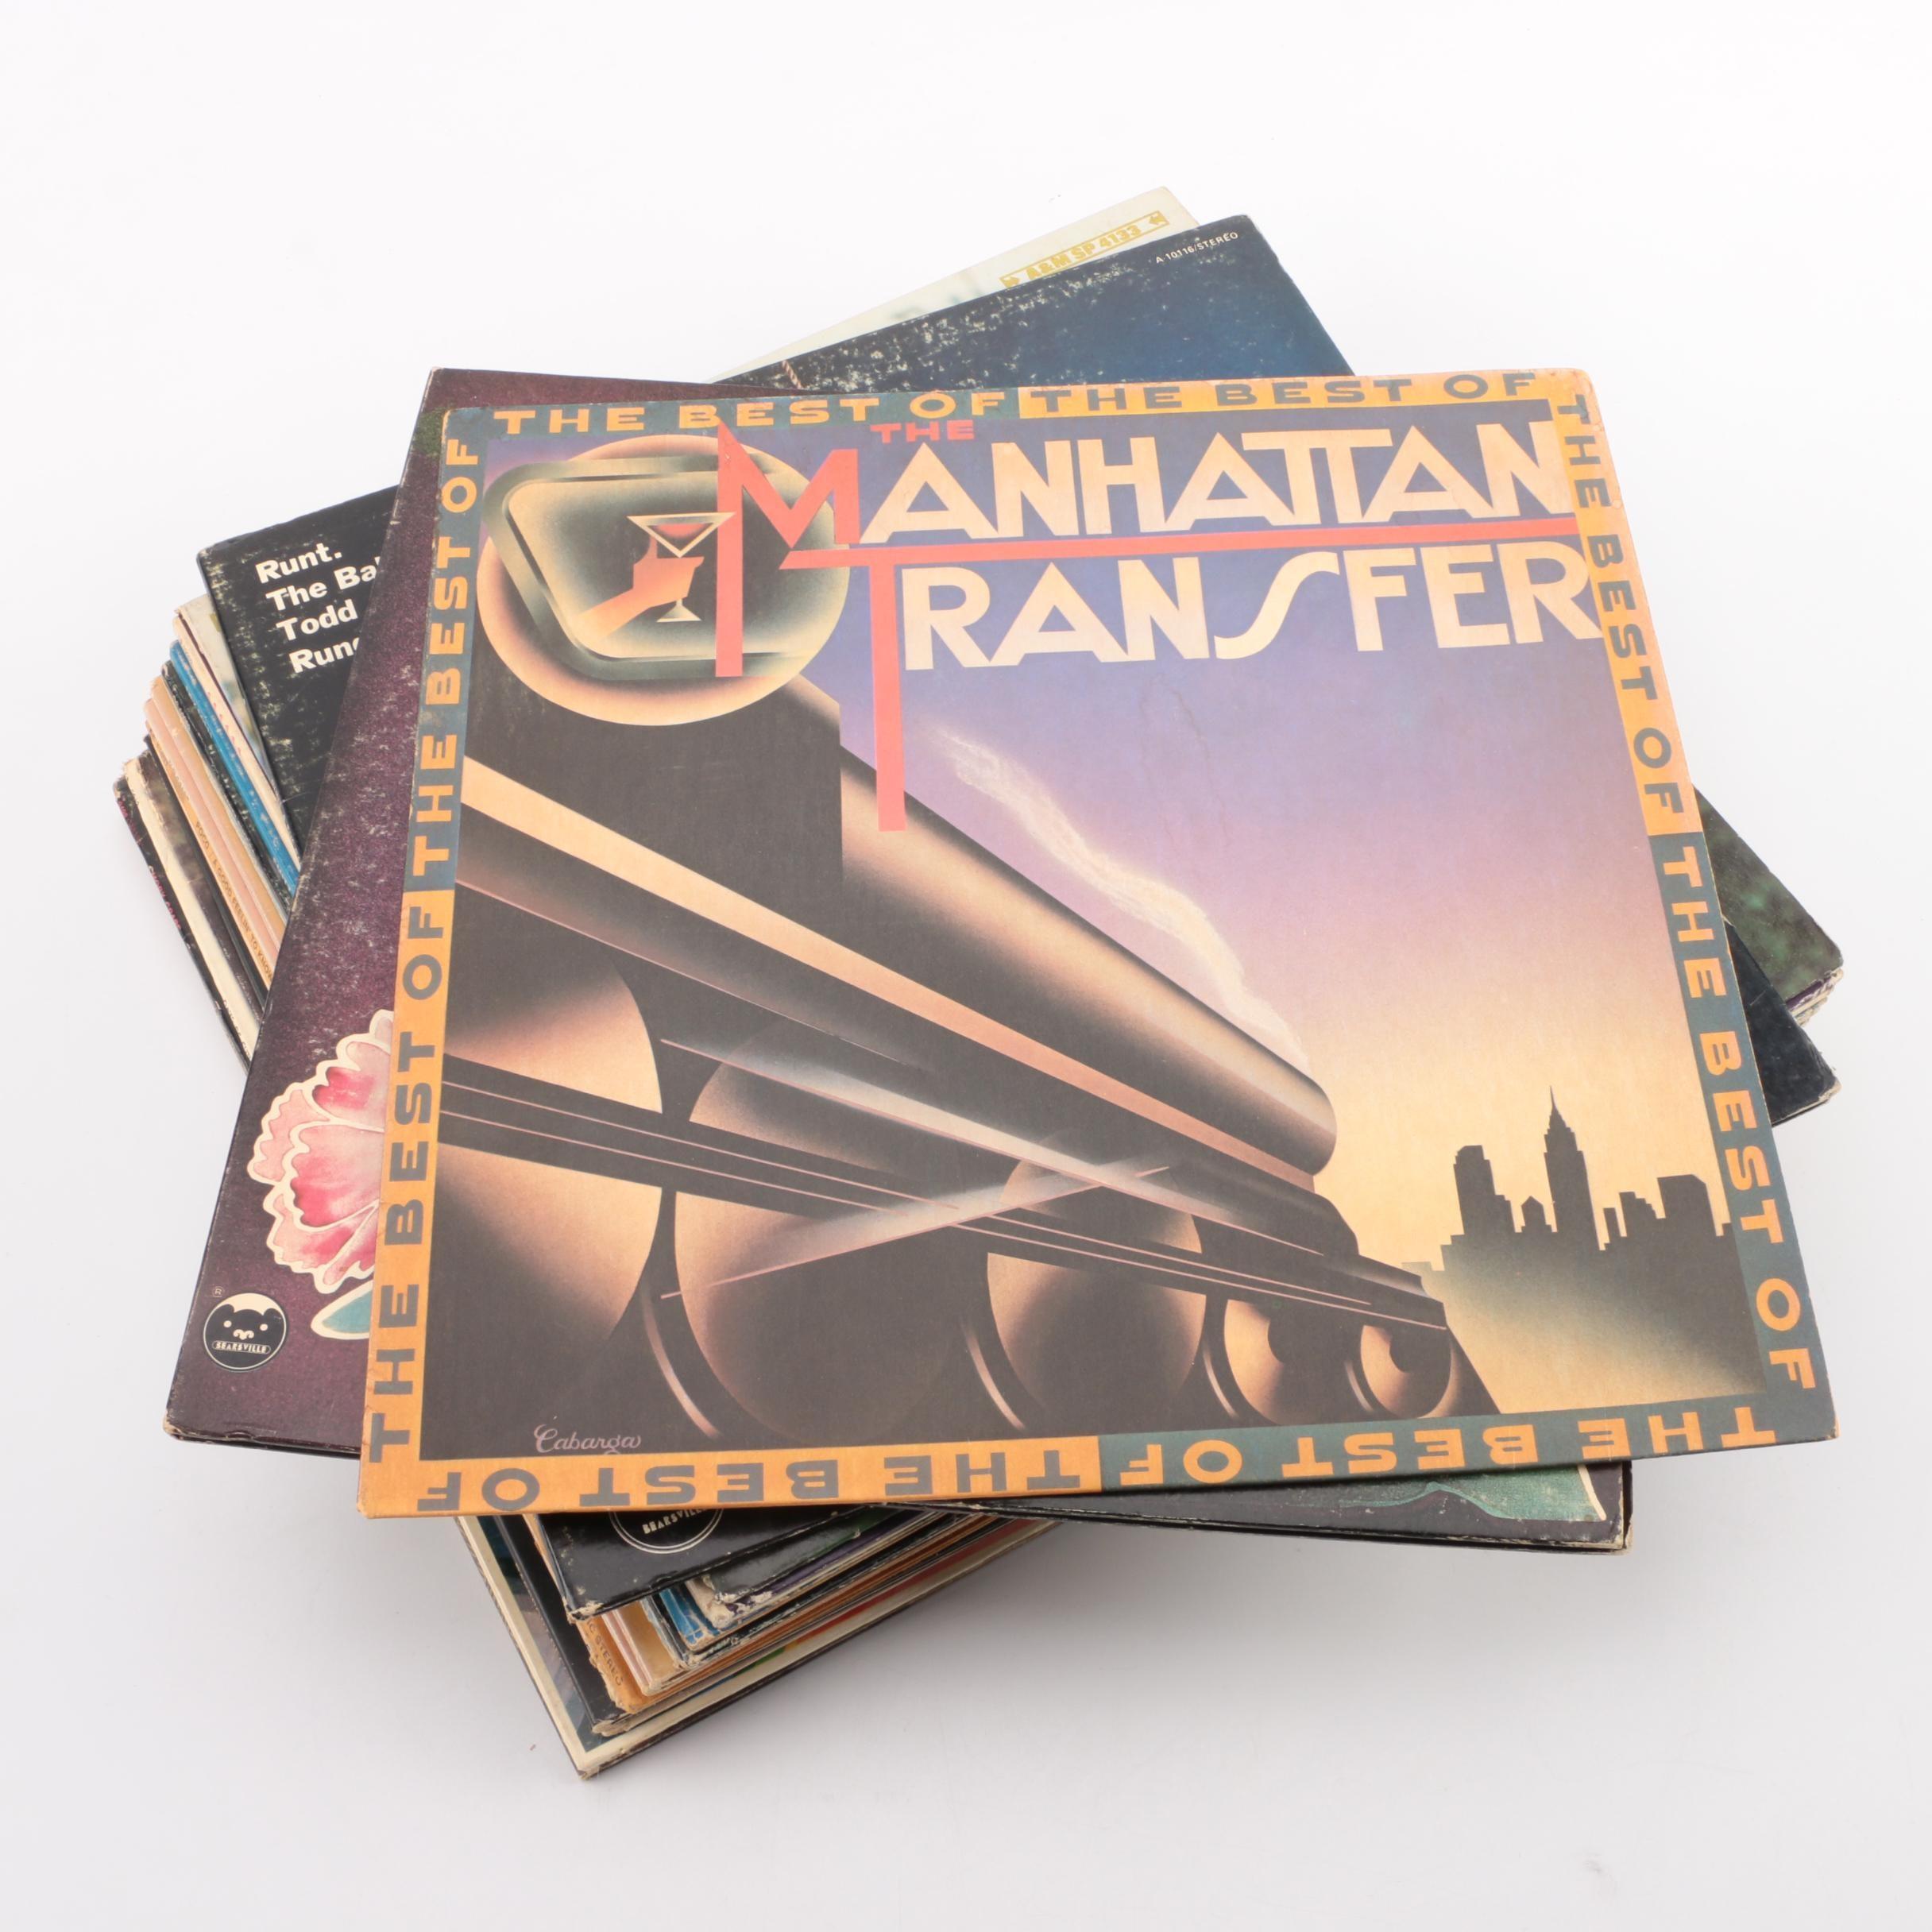 Todd Rundgren, Phil Ochs, Al Kooper and Other Rock and Folk LPs